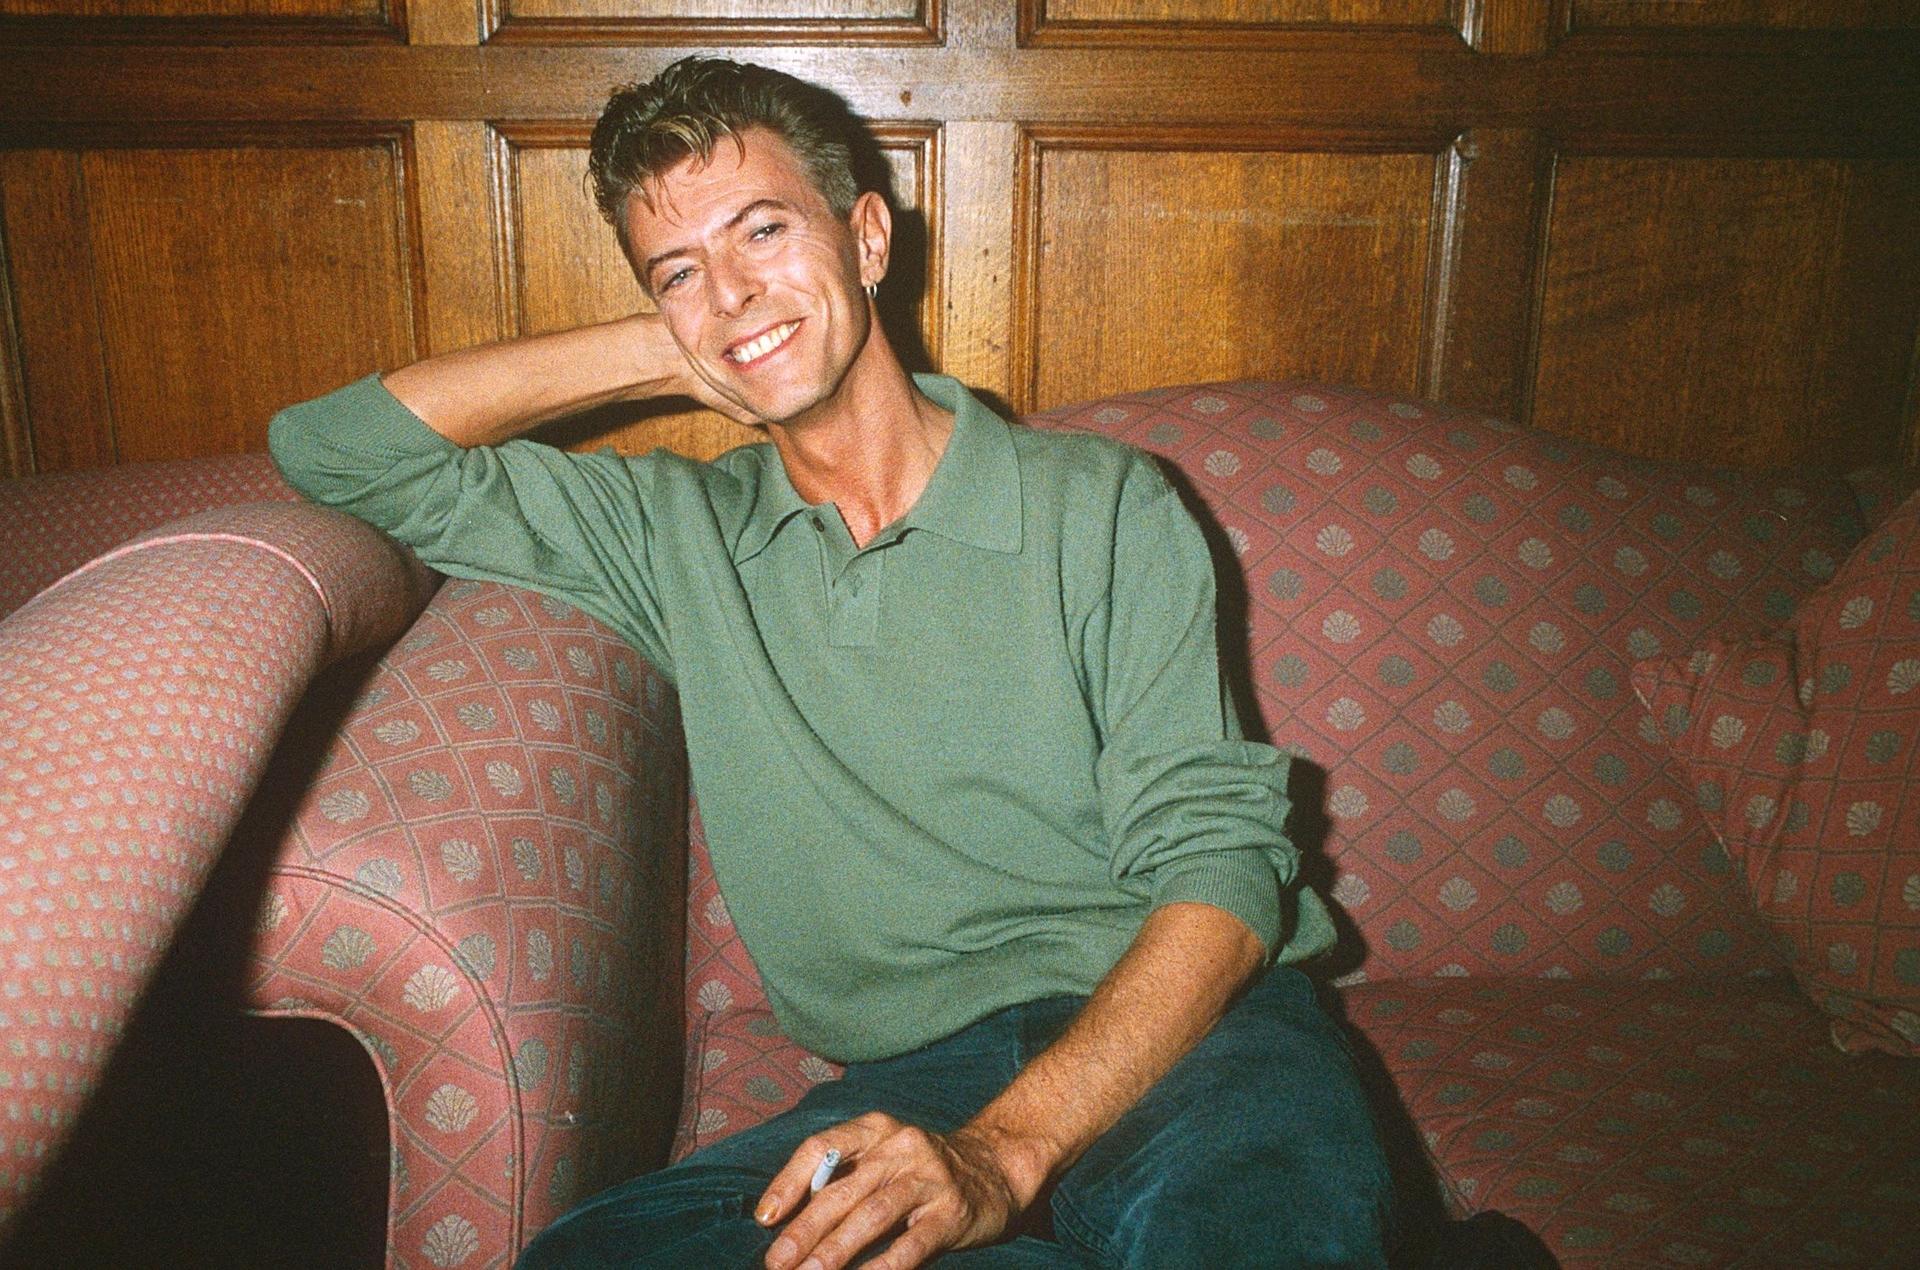 Дейвид Бауи през 1991 г. Фотограф: Richard Young / REX / Shutterstock